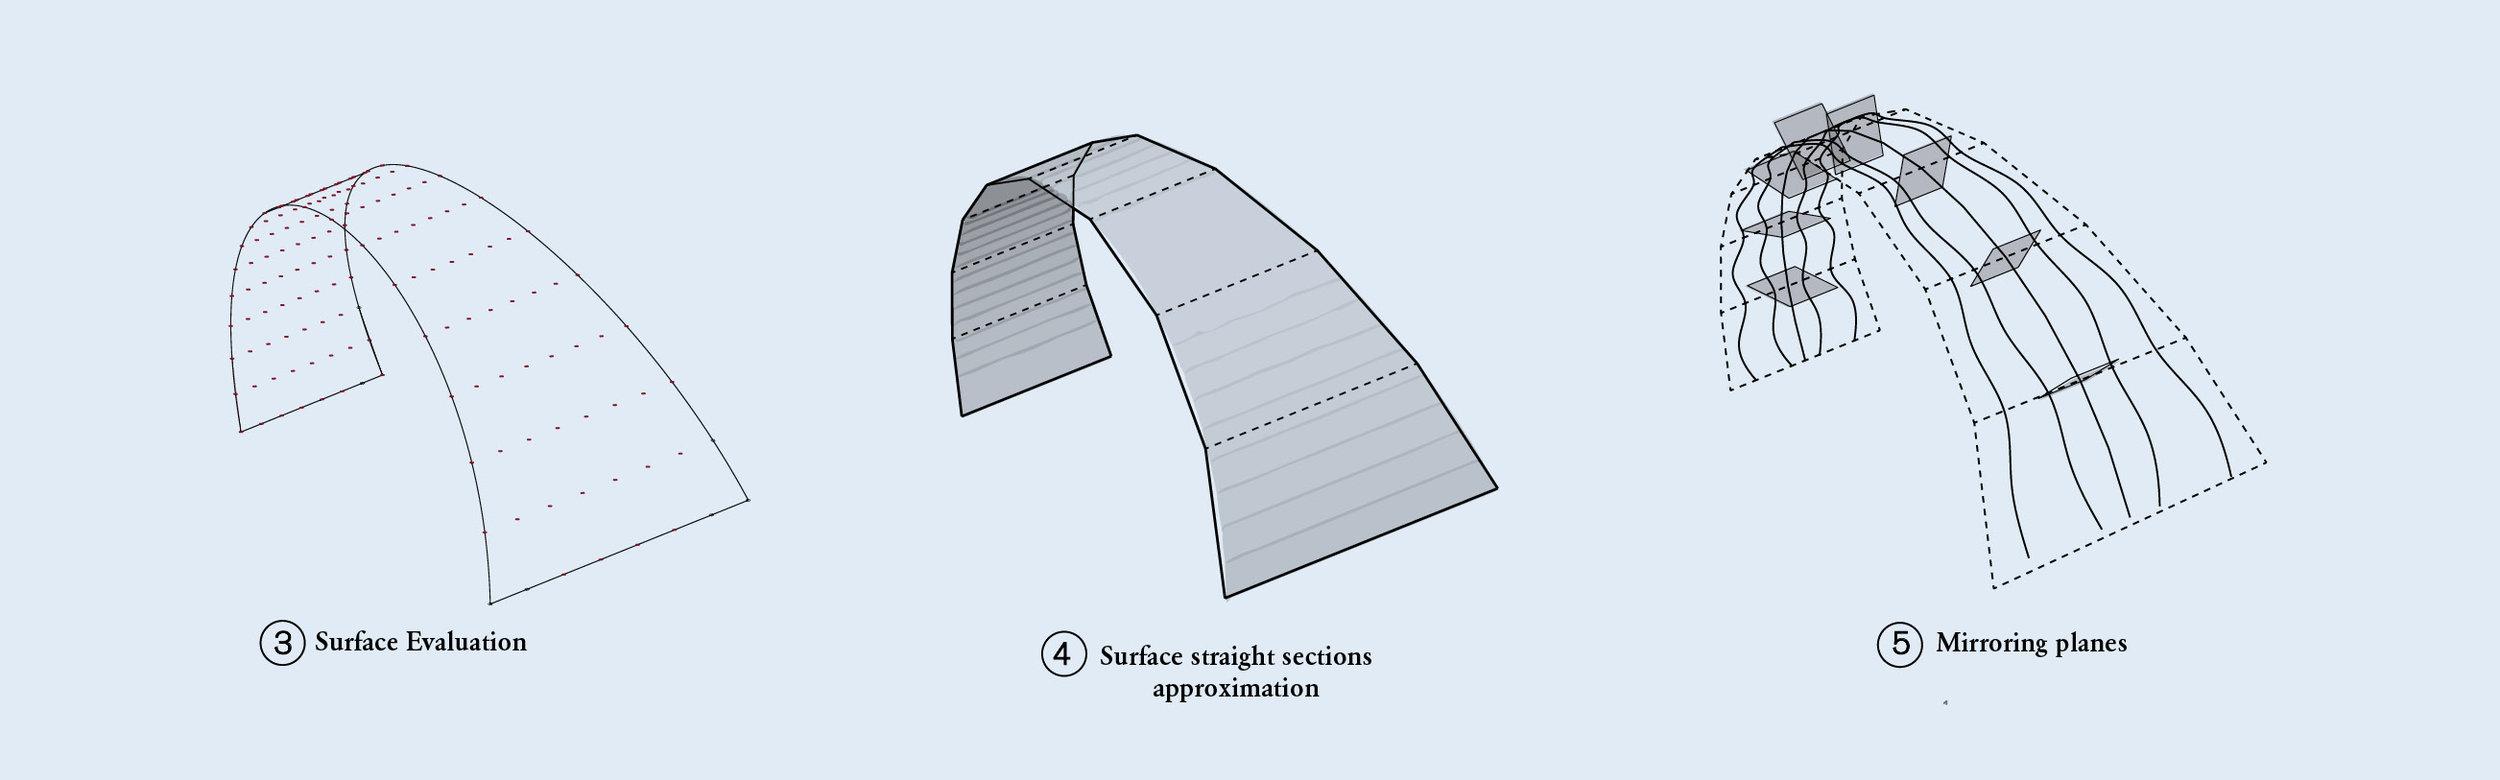 StructuralFolding_Banner02.jpg